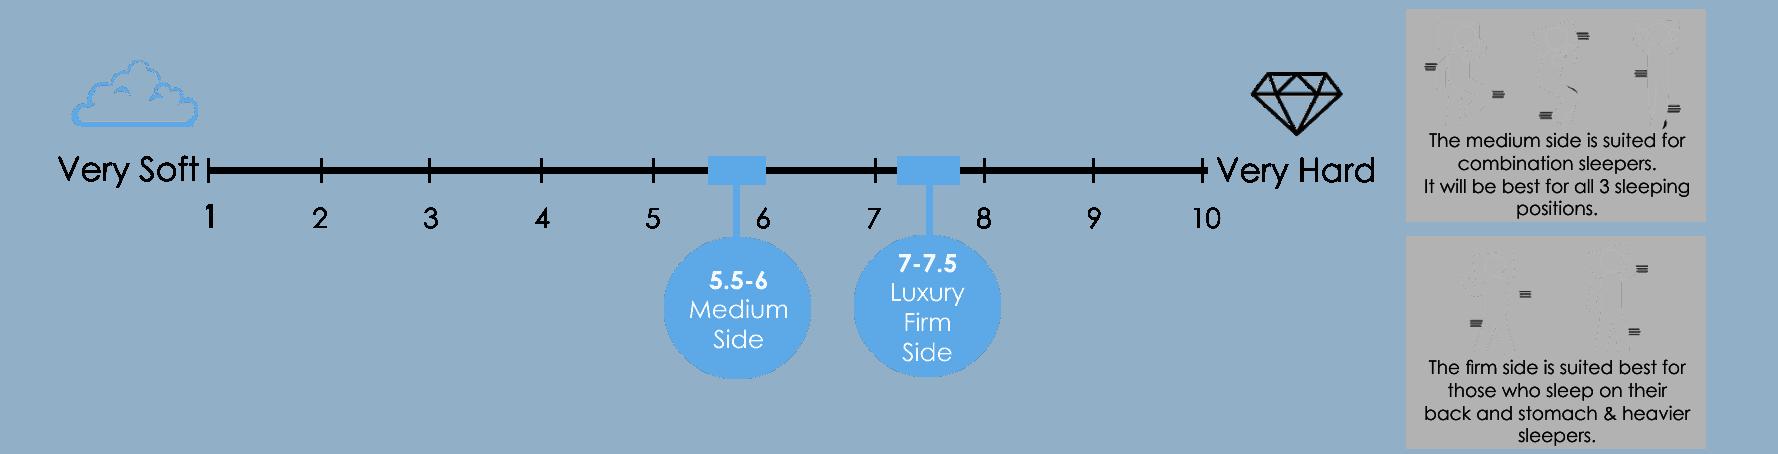 Firmness scale of idle sleep mattress 12 inches all foam